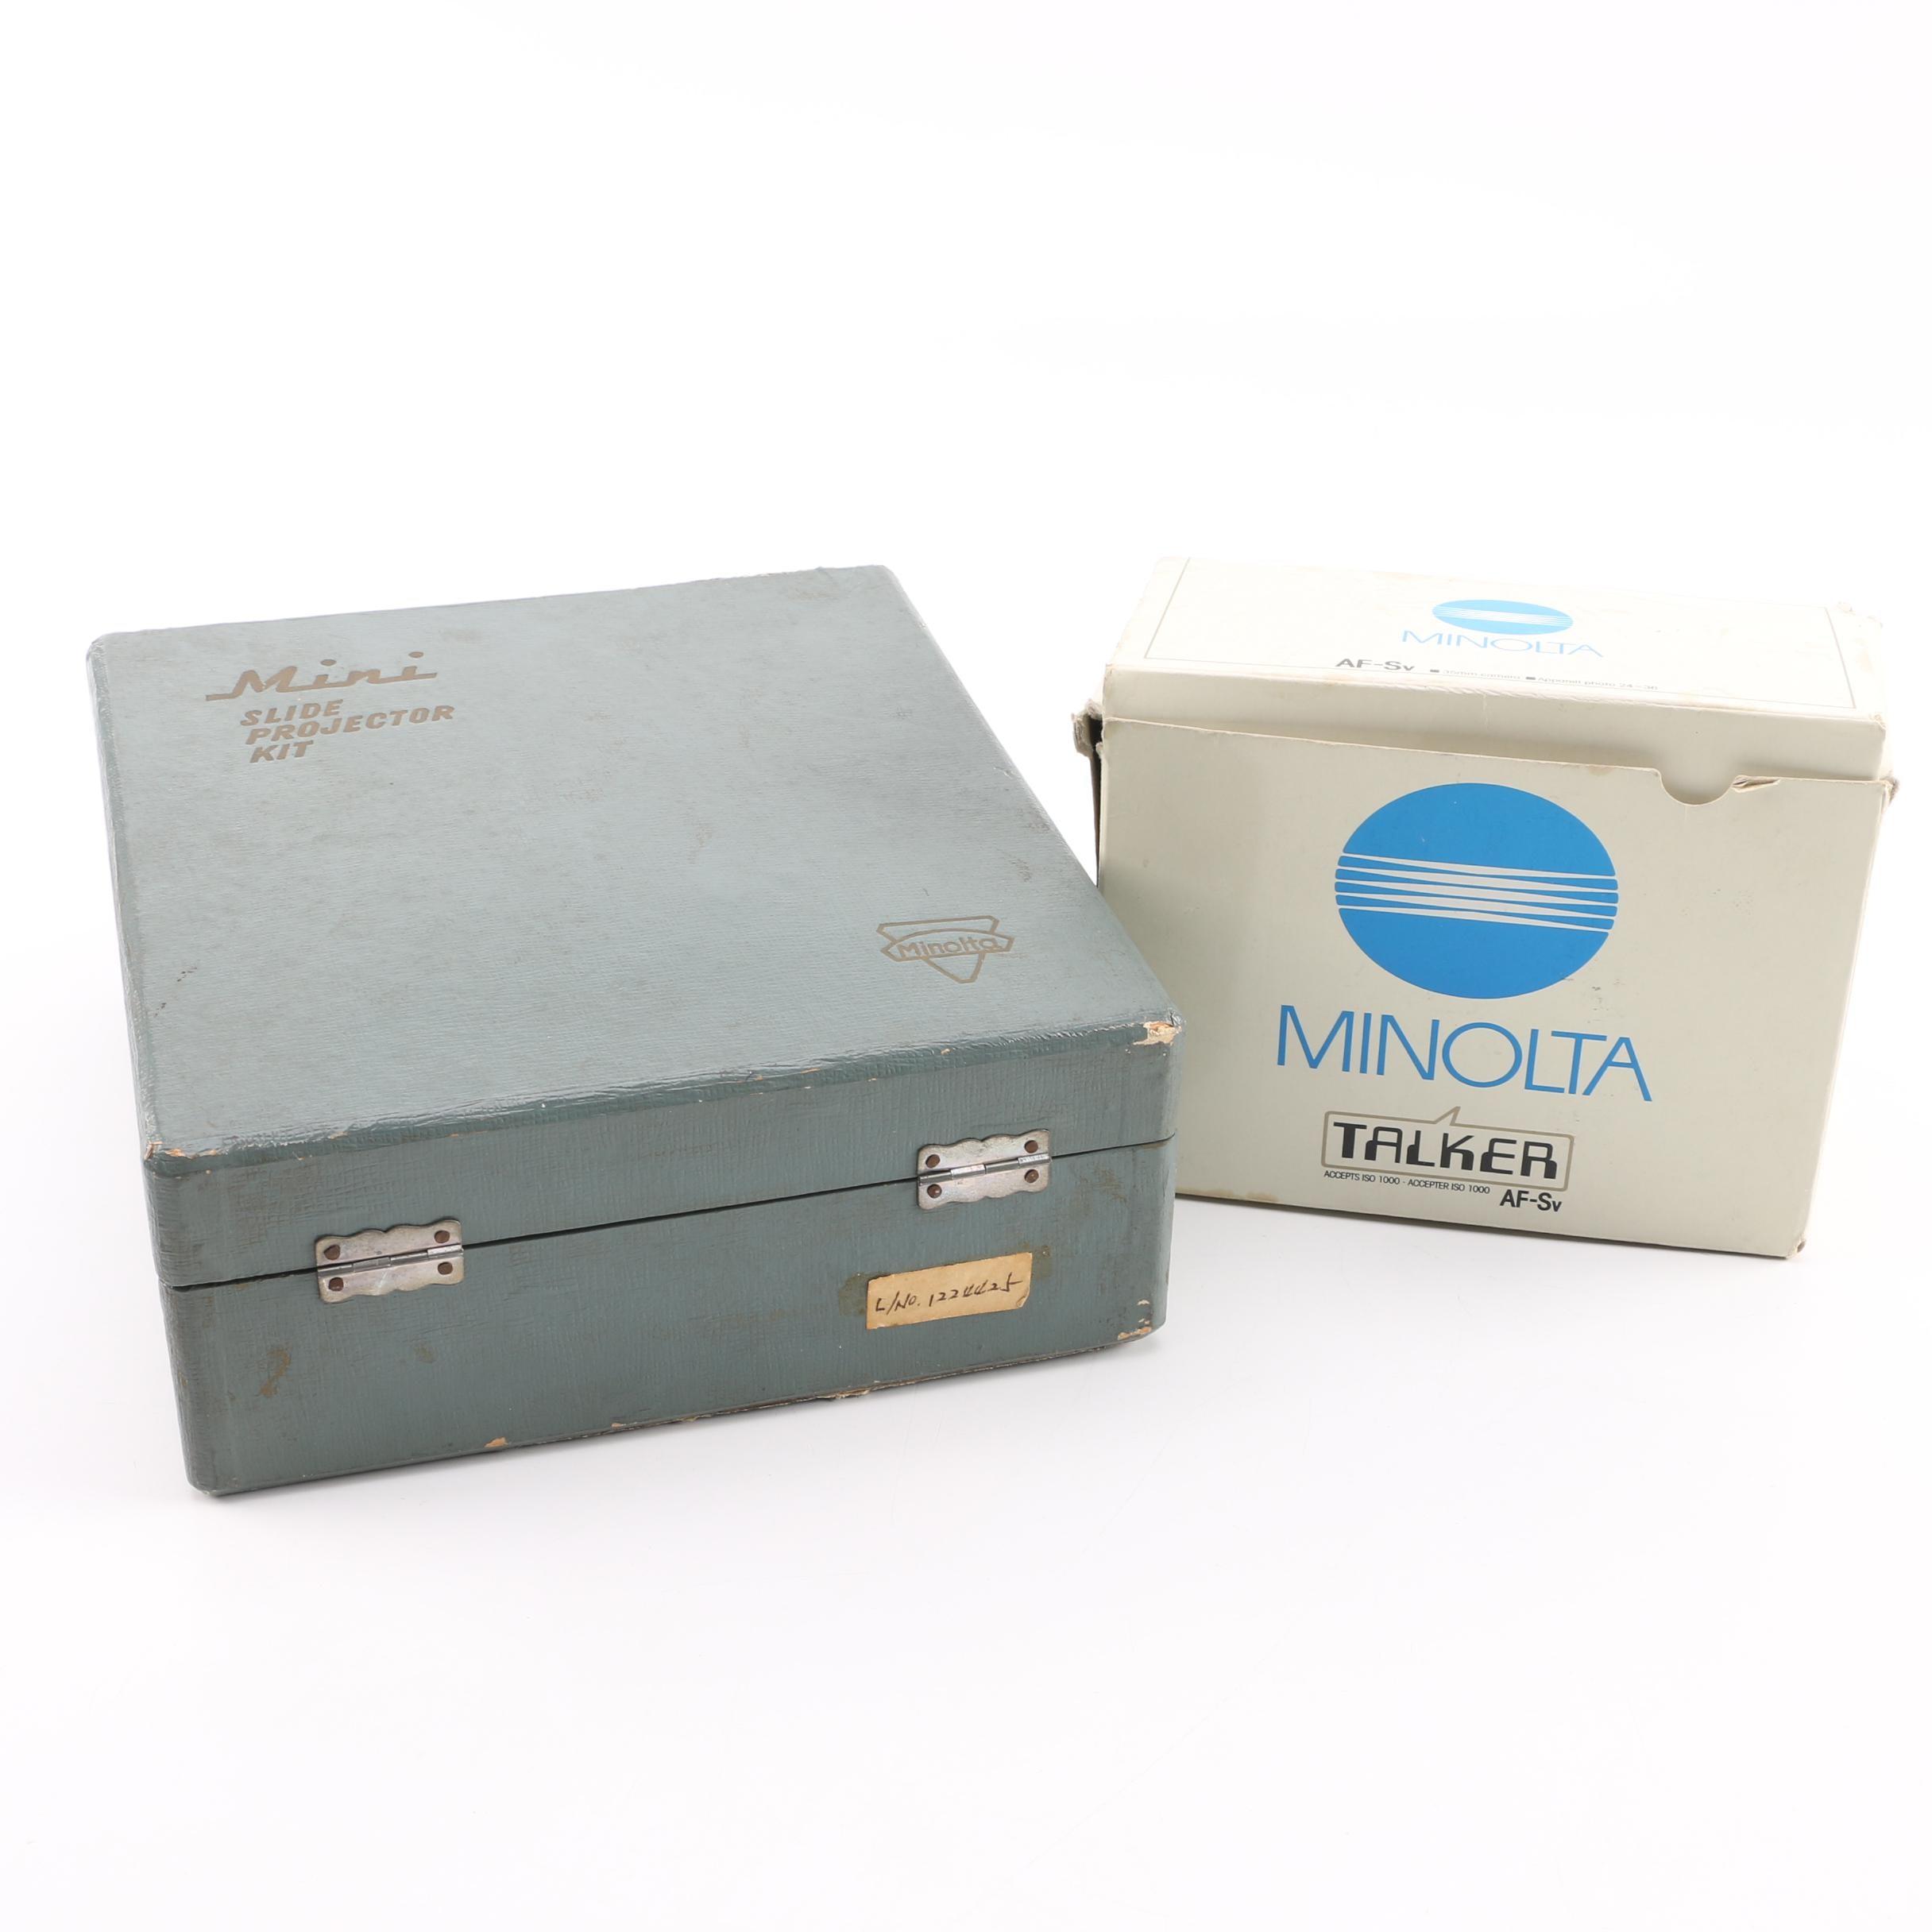 Mini Slide Projector Kit and Minolta Camera